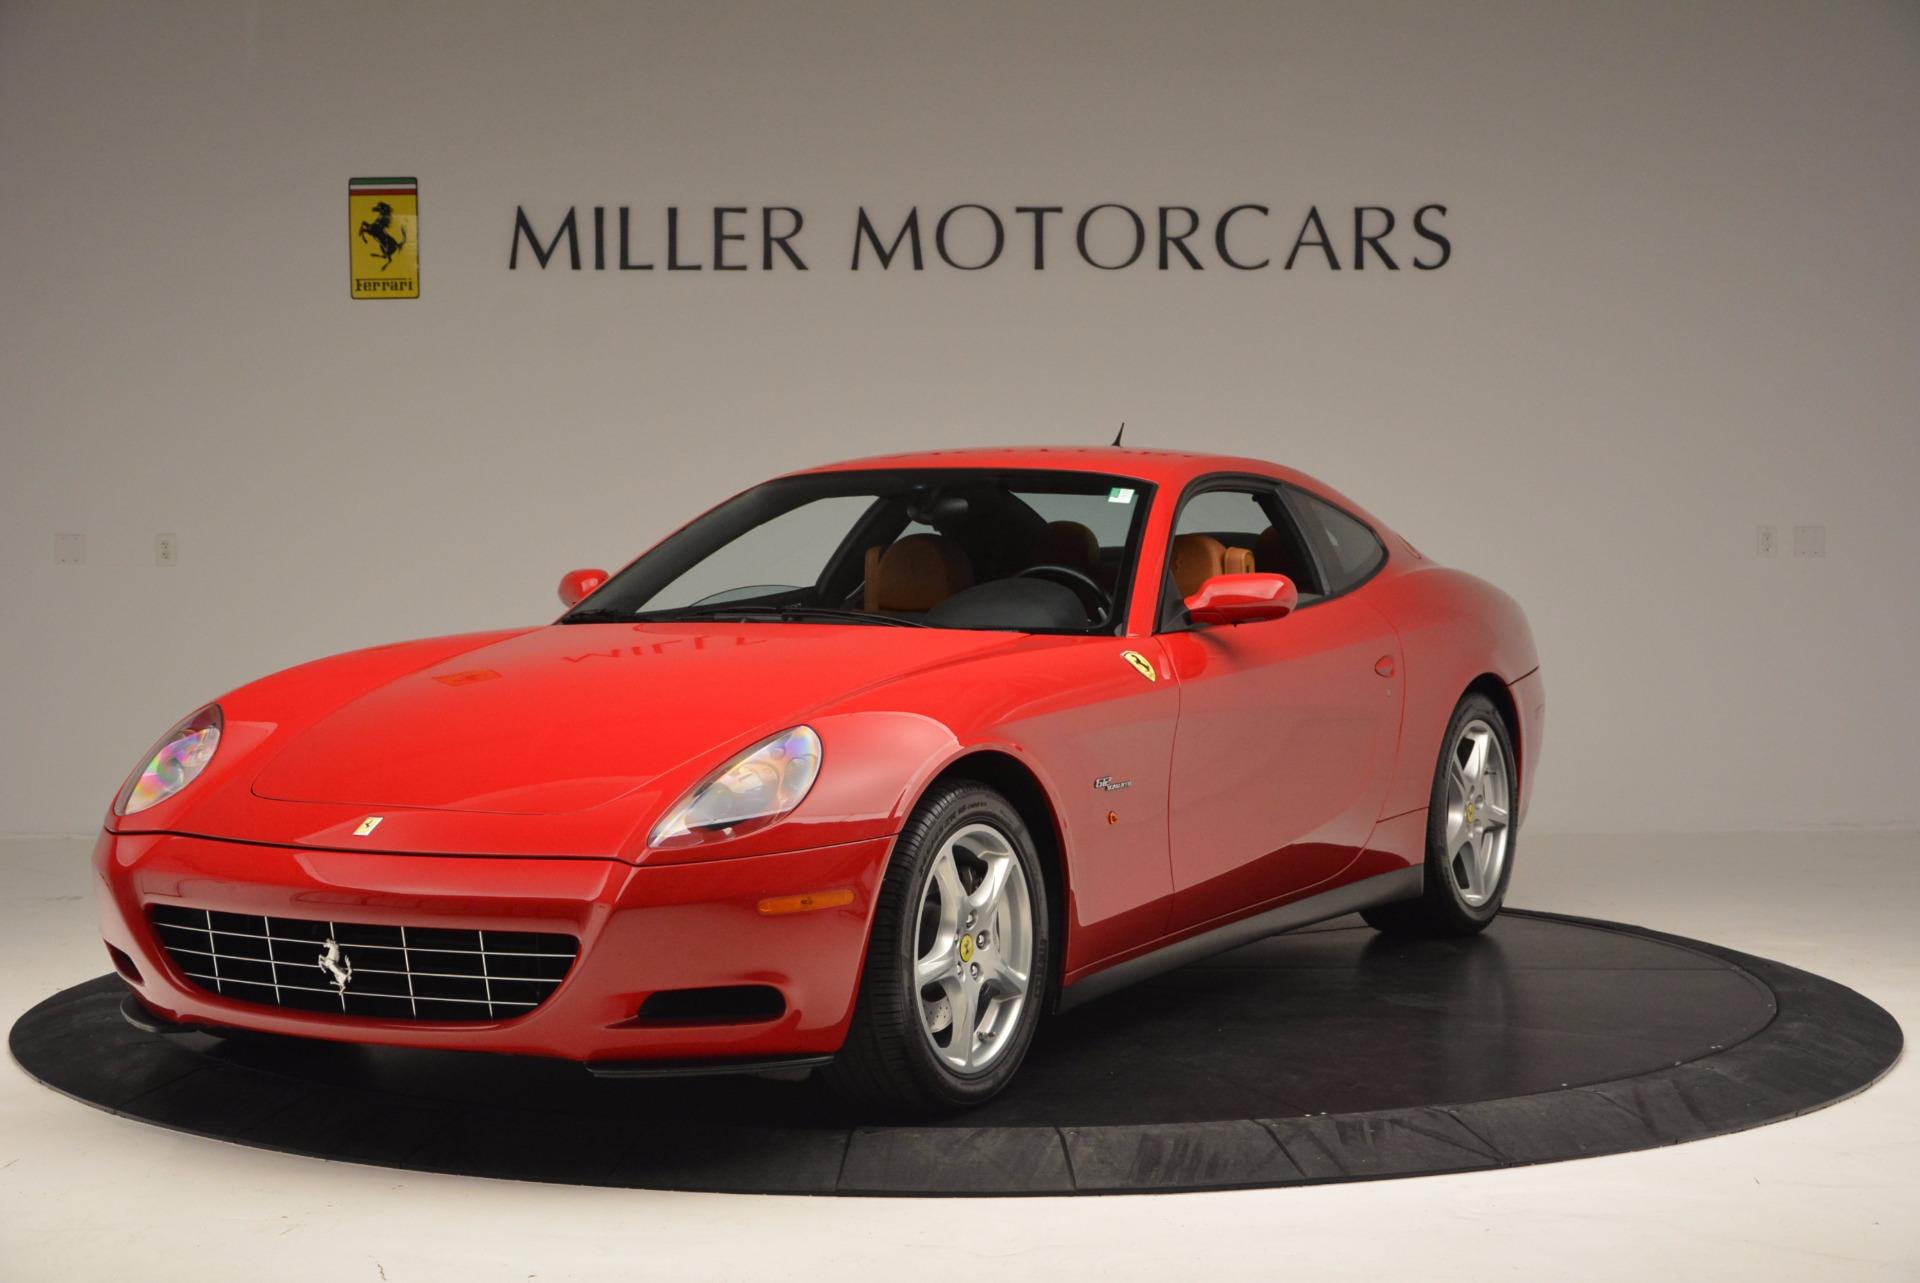 Used 2005 Ferrari 612 Scaglietti for sale Sold at Maserati of Westport in Westport CT 06880 1